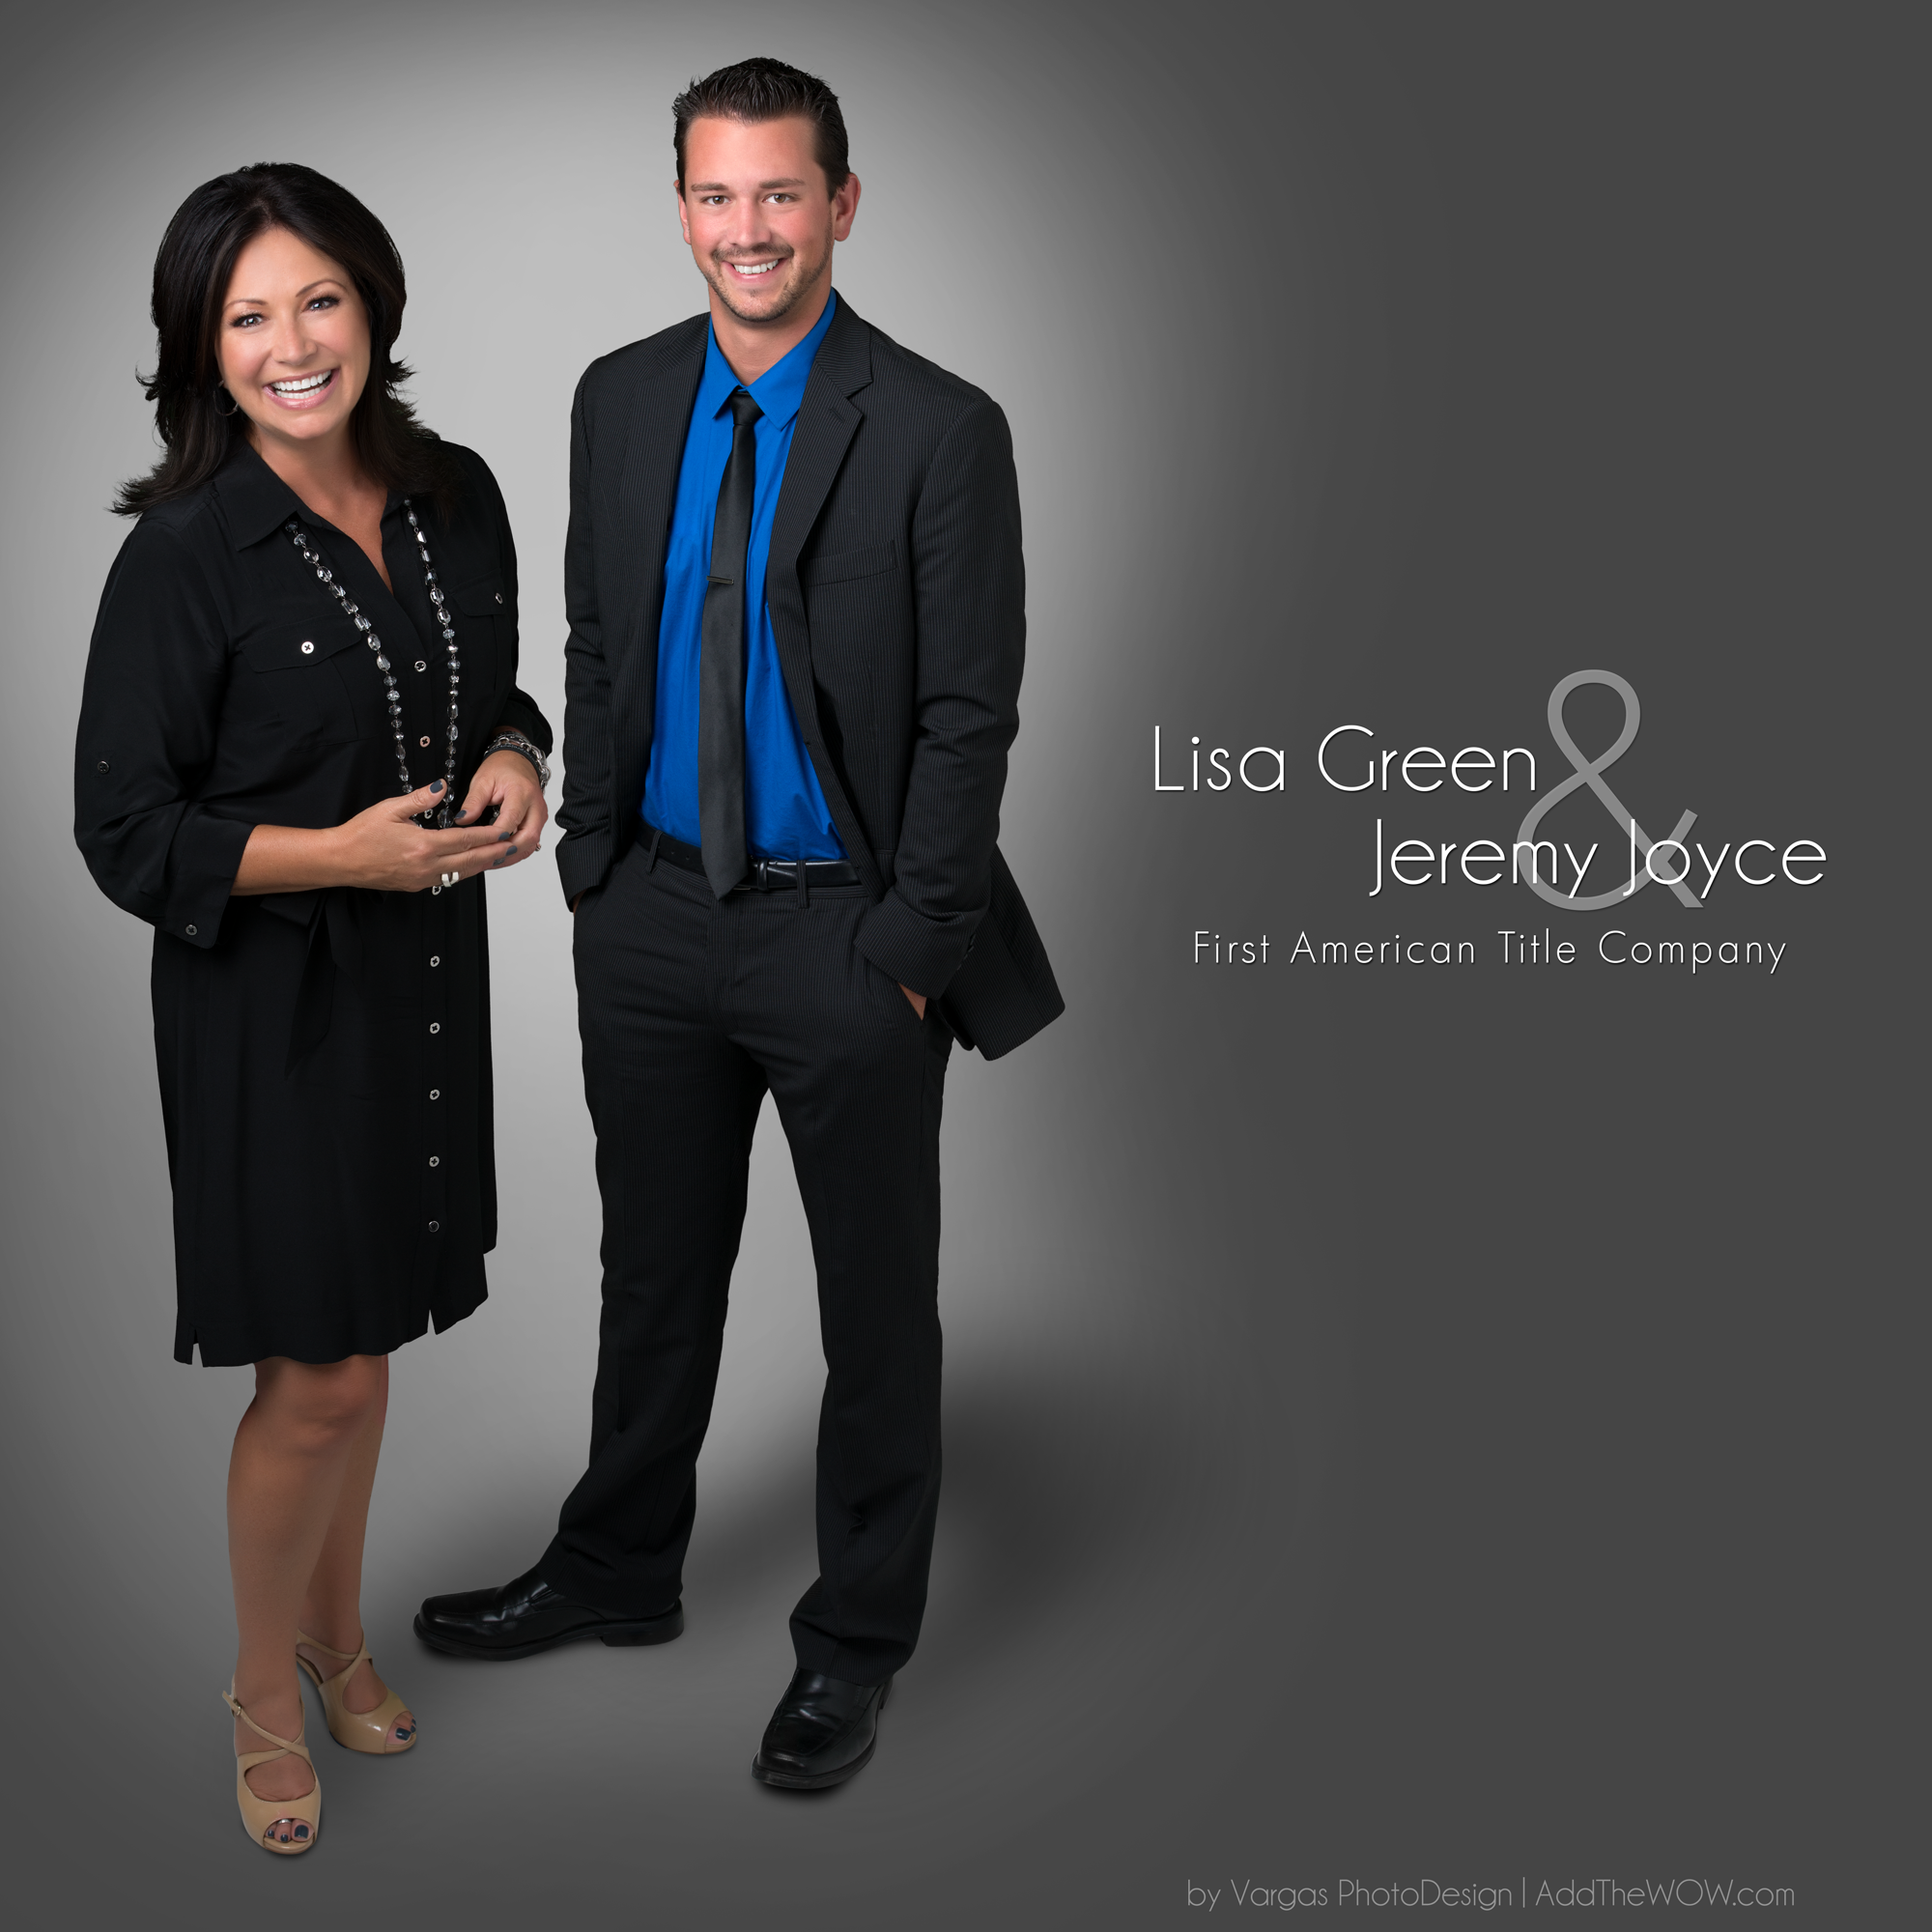 Lisa-Green-First-American-Title-Joyce-Team-Photo.png